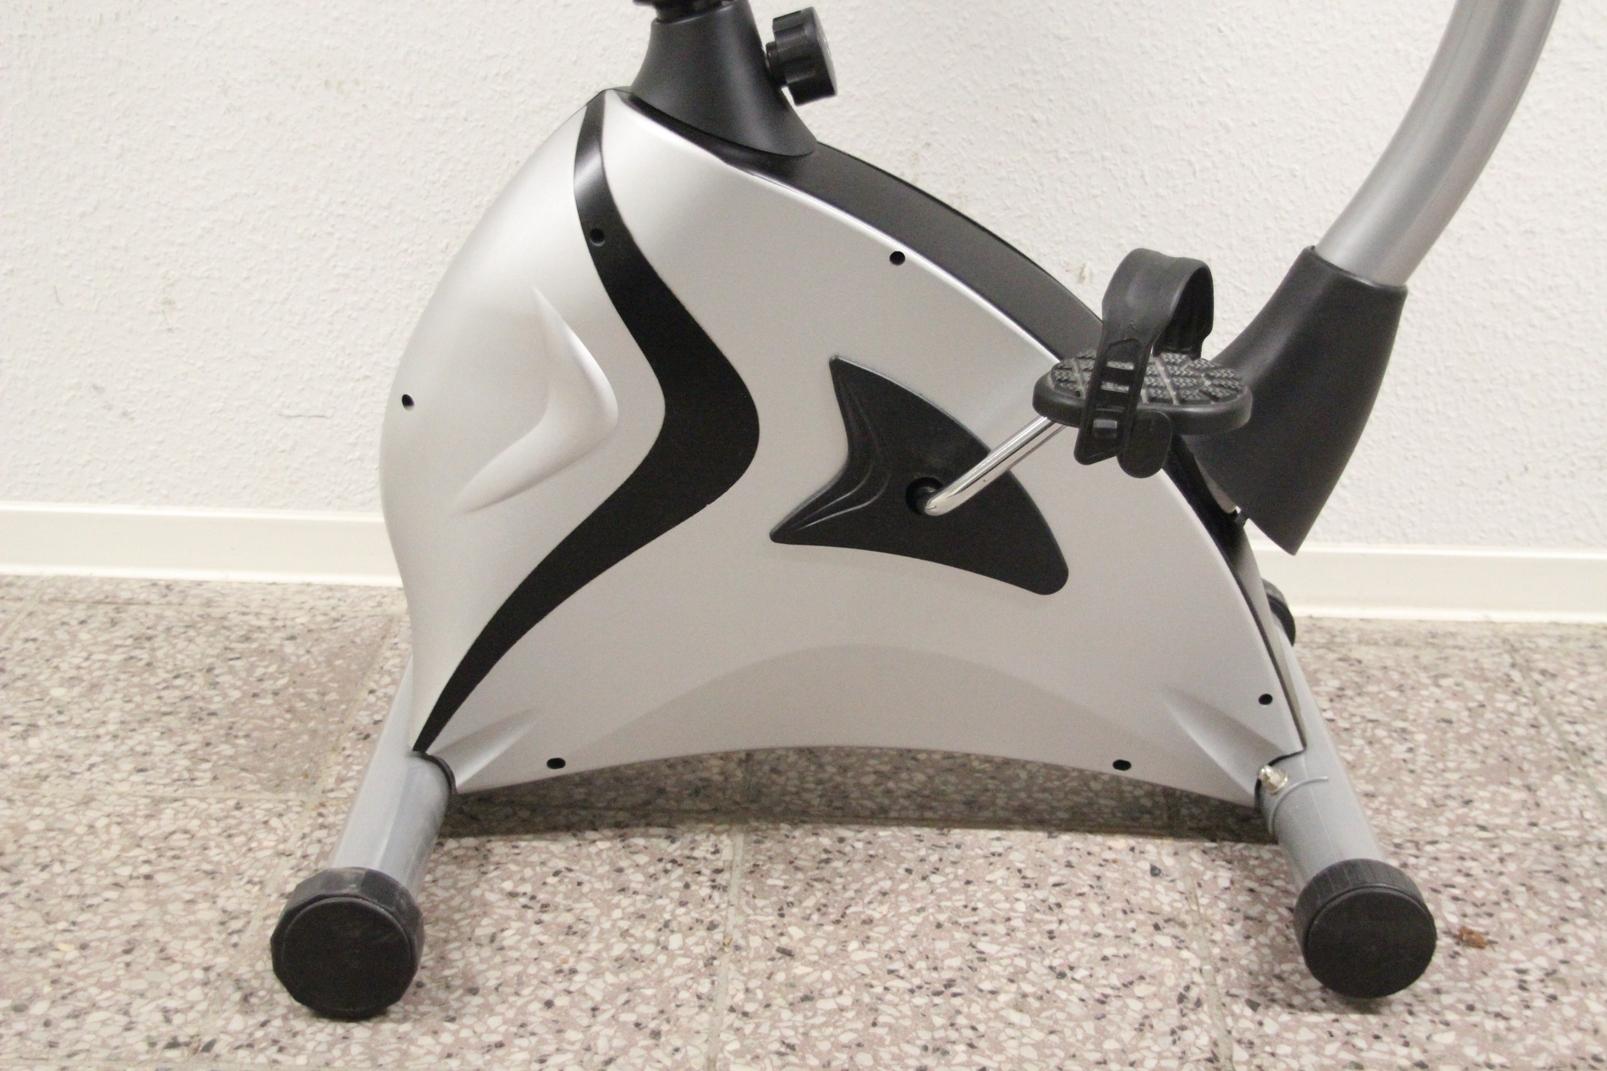 alex htx fahrrad heimtrainer ergometer trainingscomputer hometrainer max 120 kg ebay. Black Bedroom Furniture Sets. Home Design Ideas